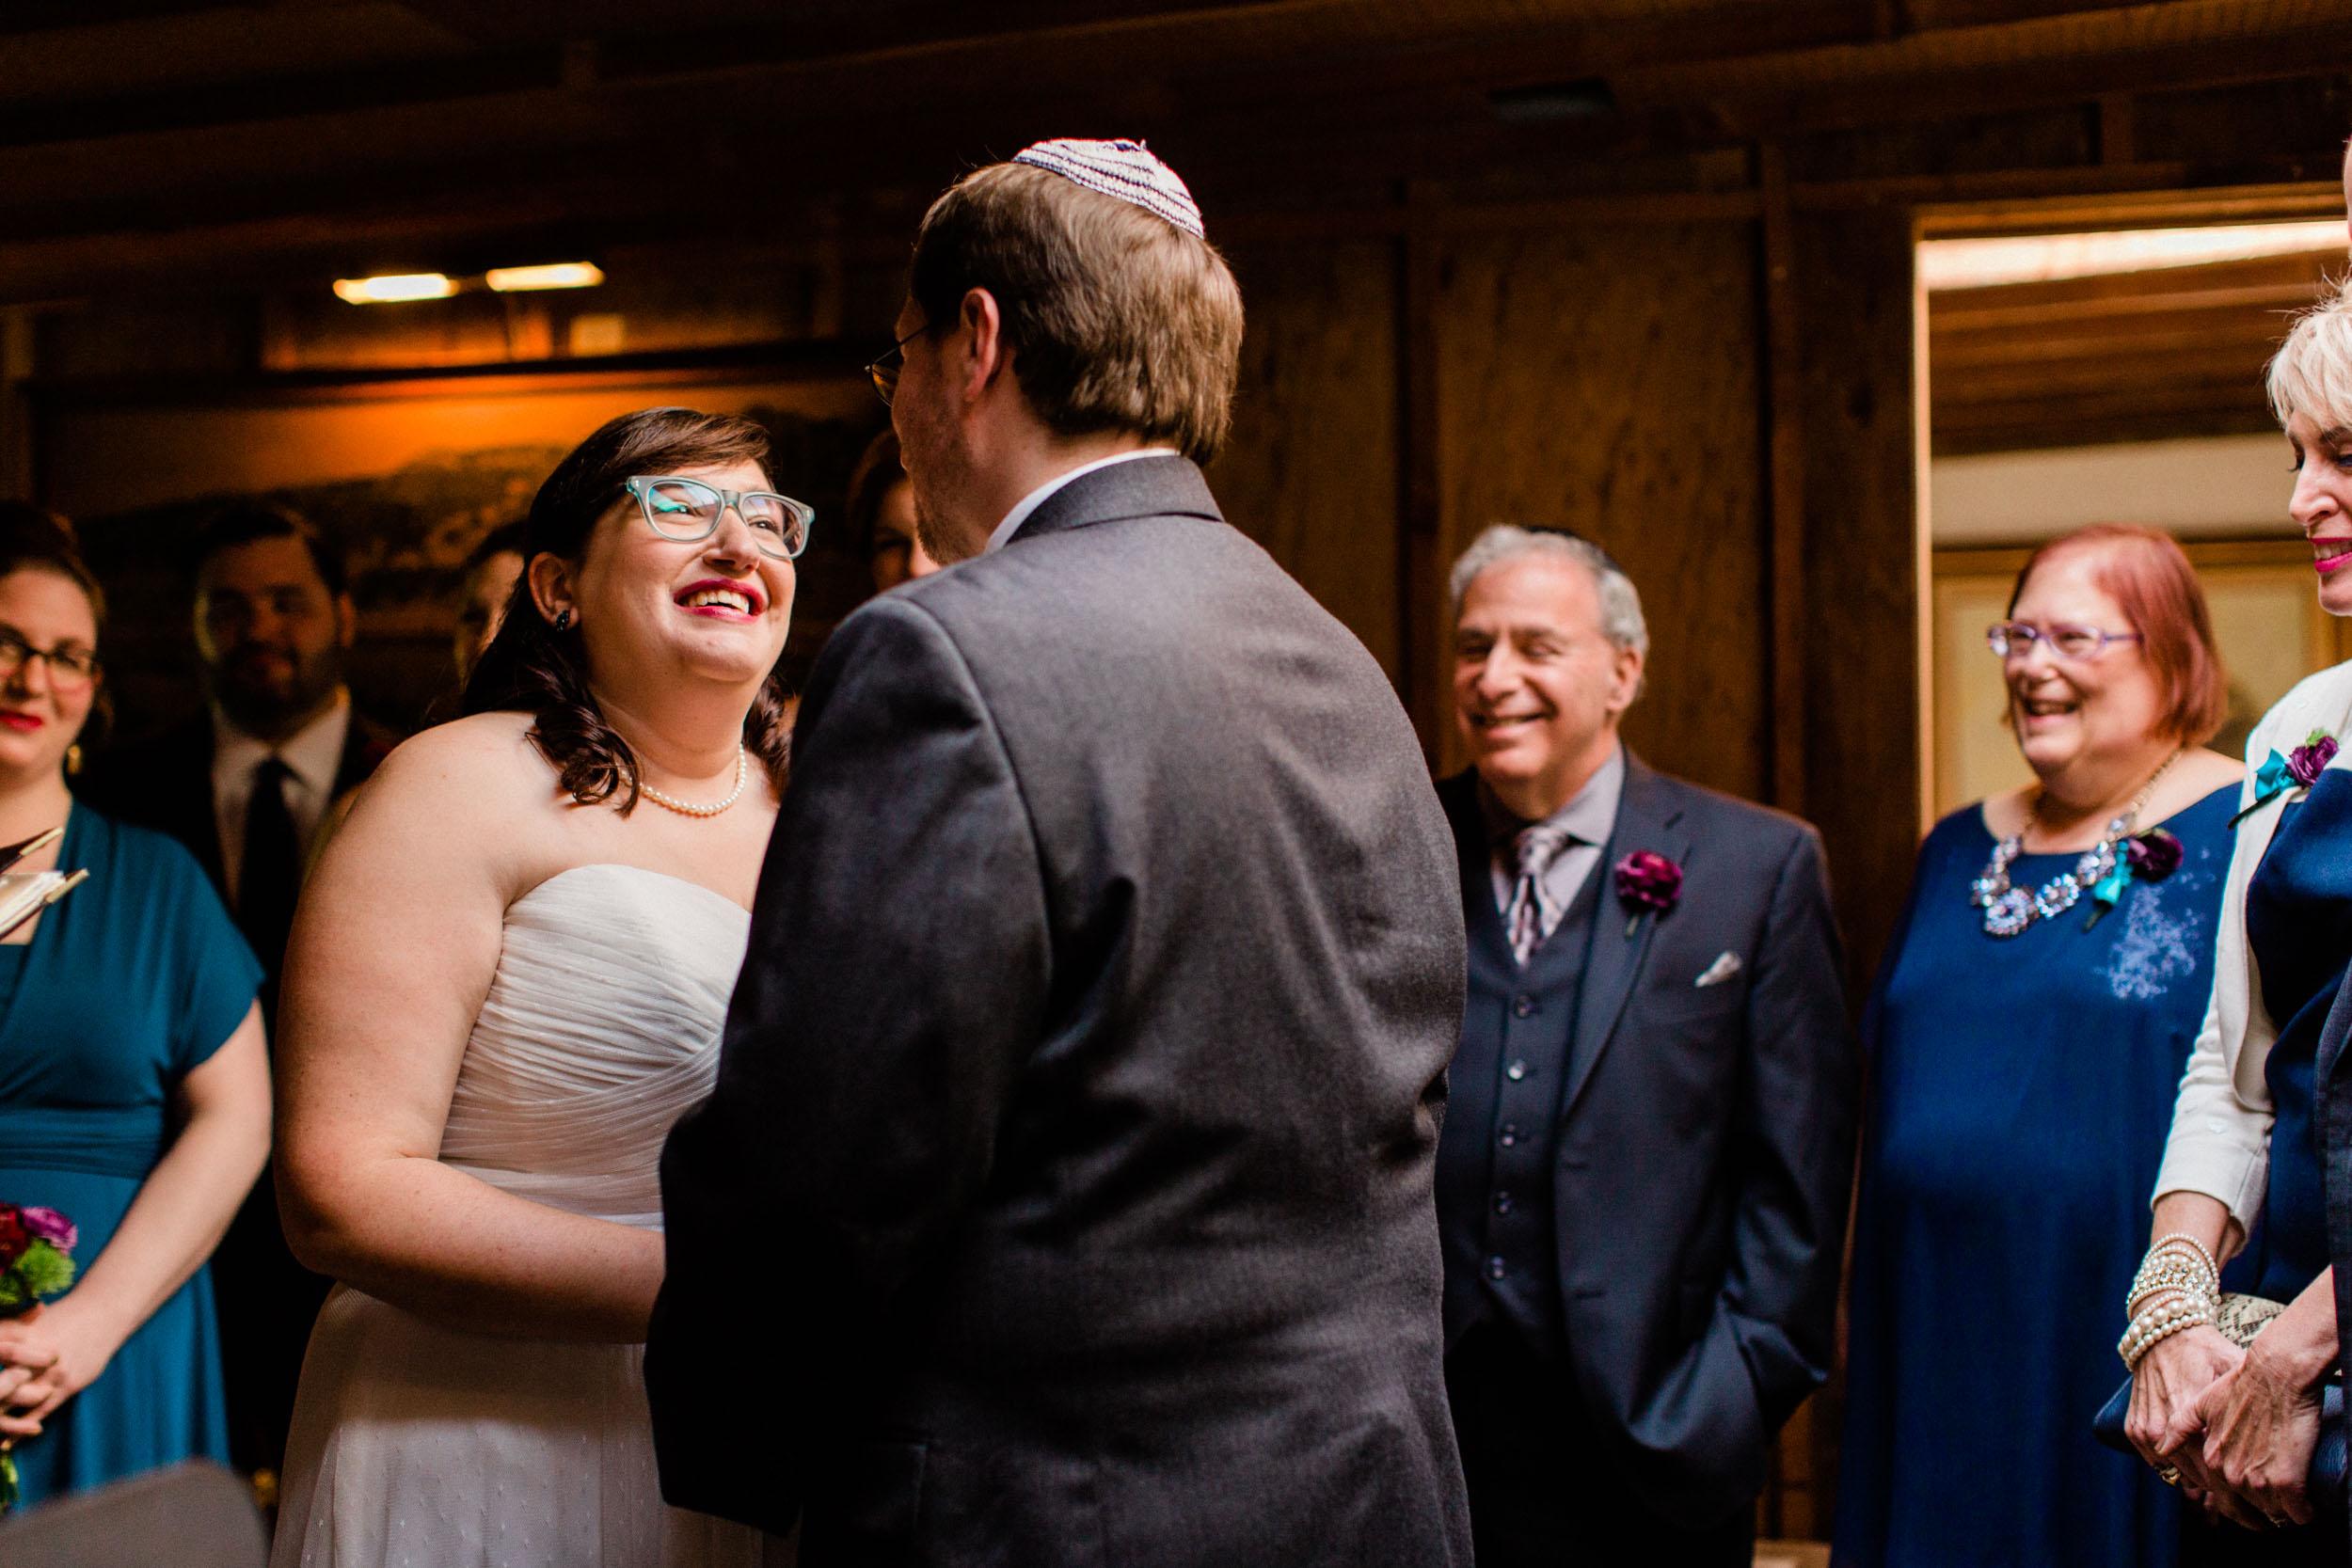 BKM-Photography-Smog-Shoppe-Culver-City-Wedding-Photographer-Culver-Hotel-0041.jpg